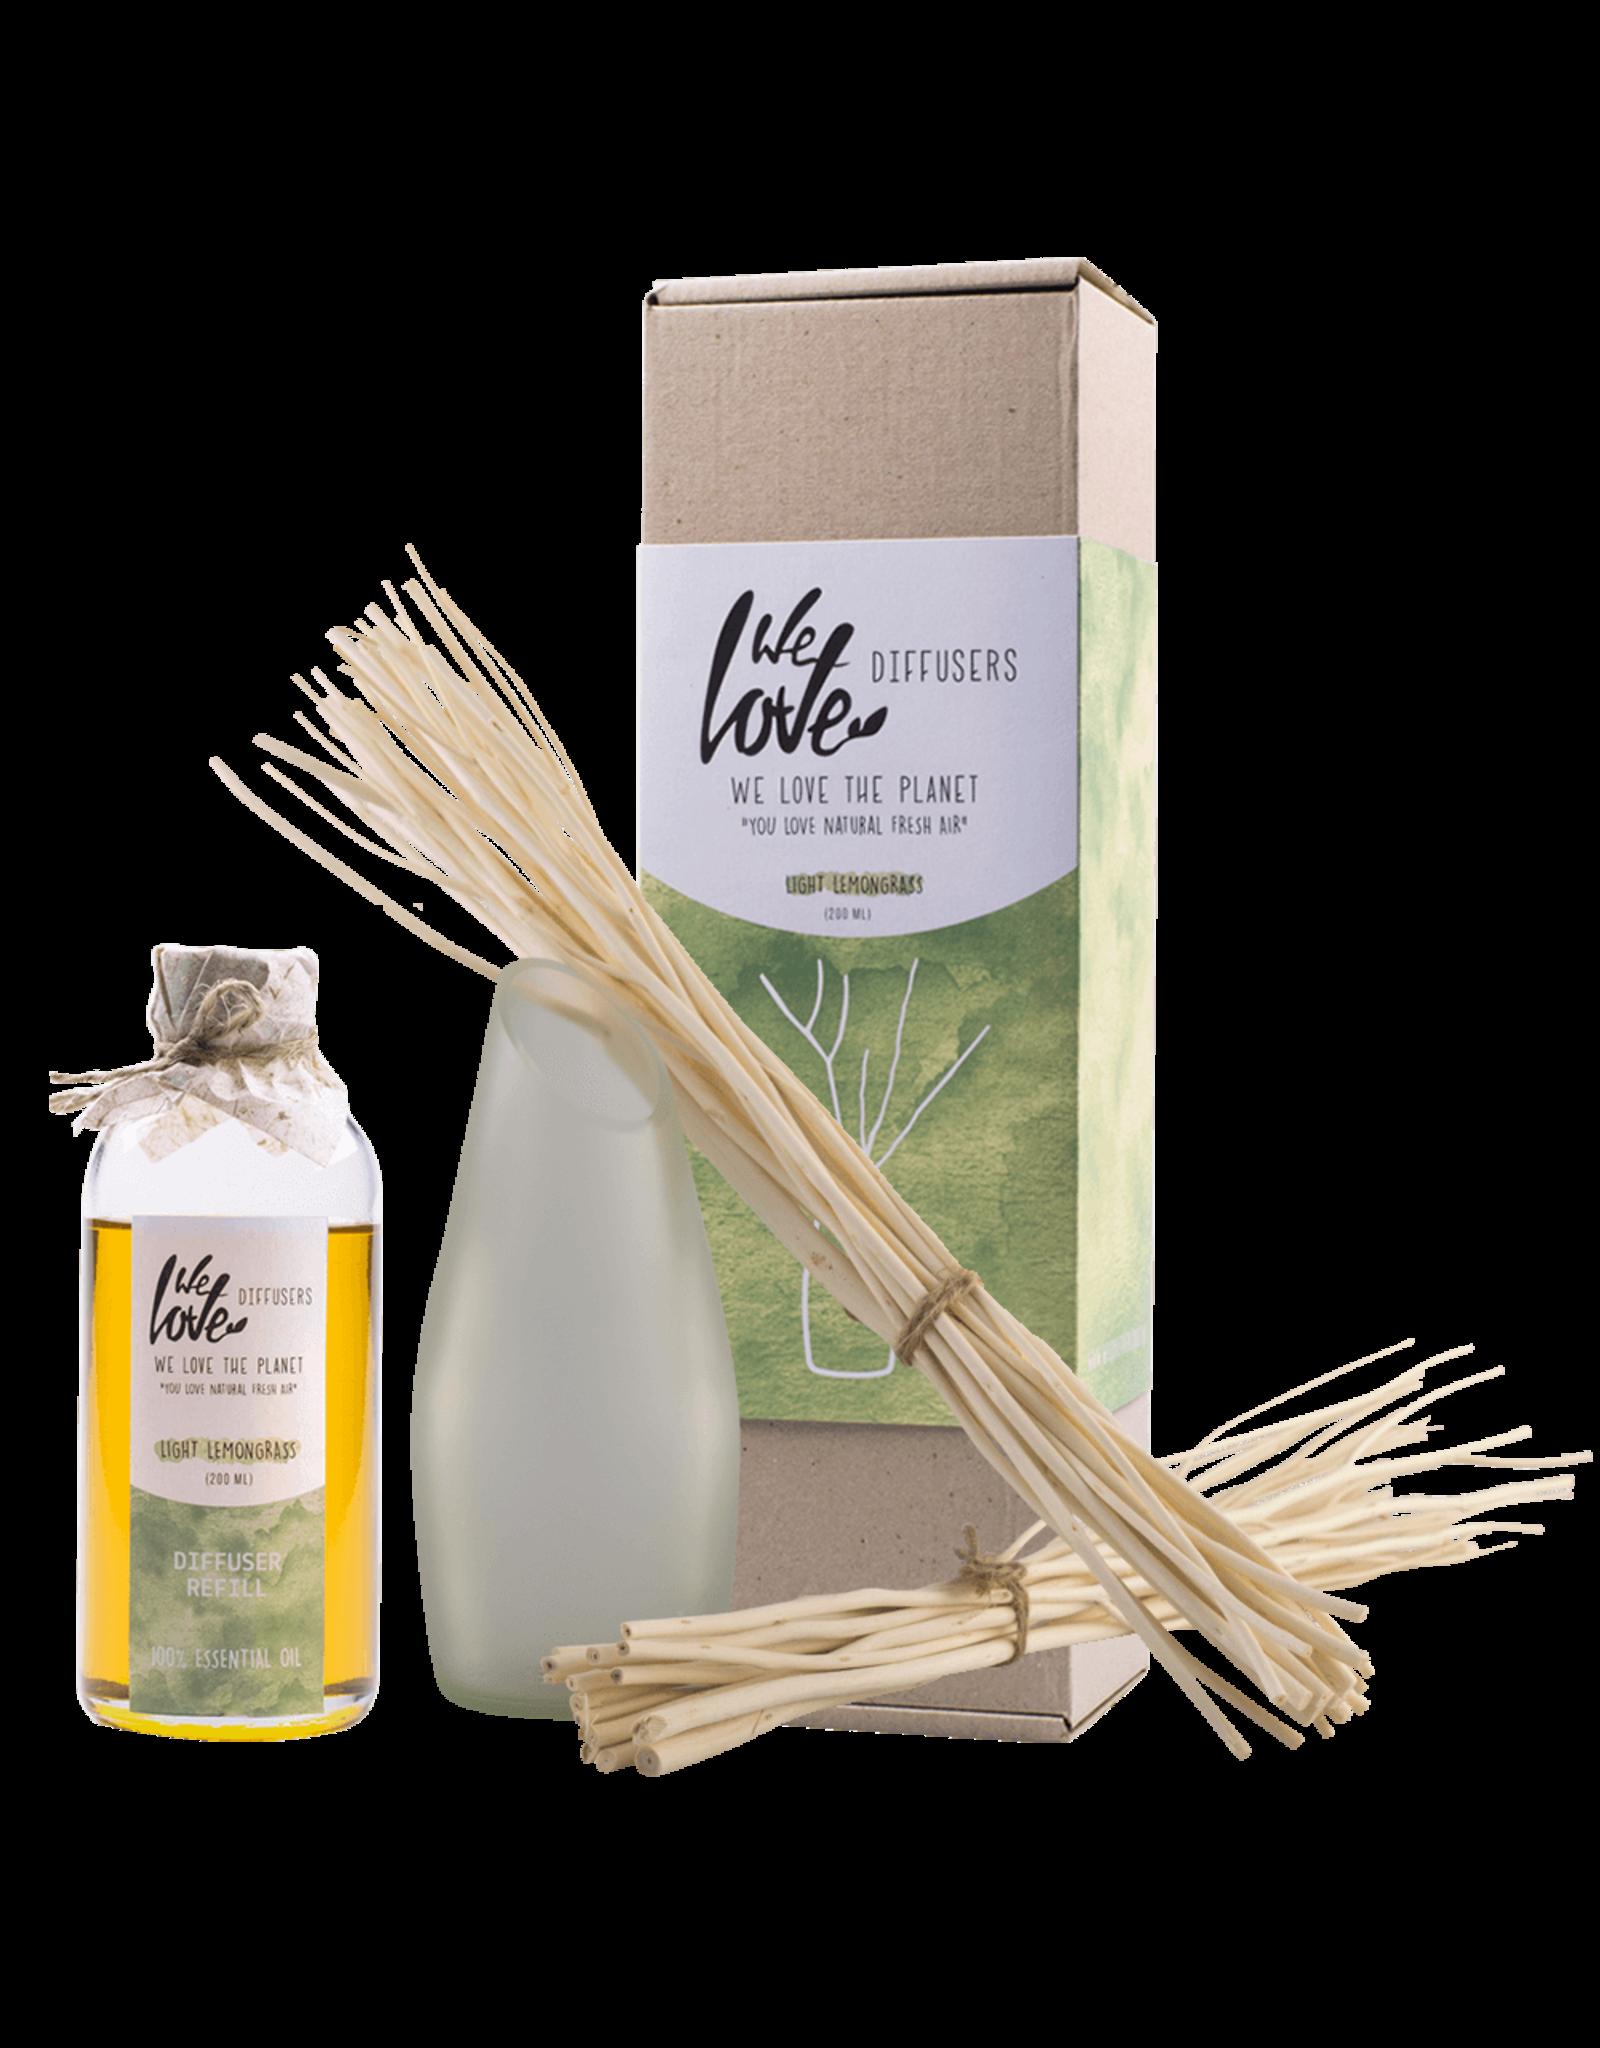 We Love The Planet Diffuser set 200ml (essential oil) Light Lemon Grass